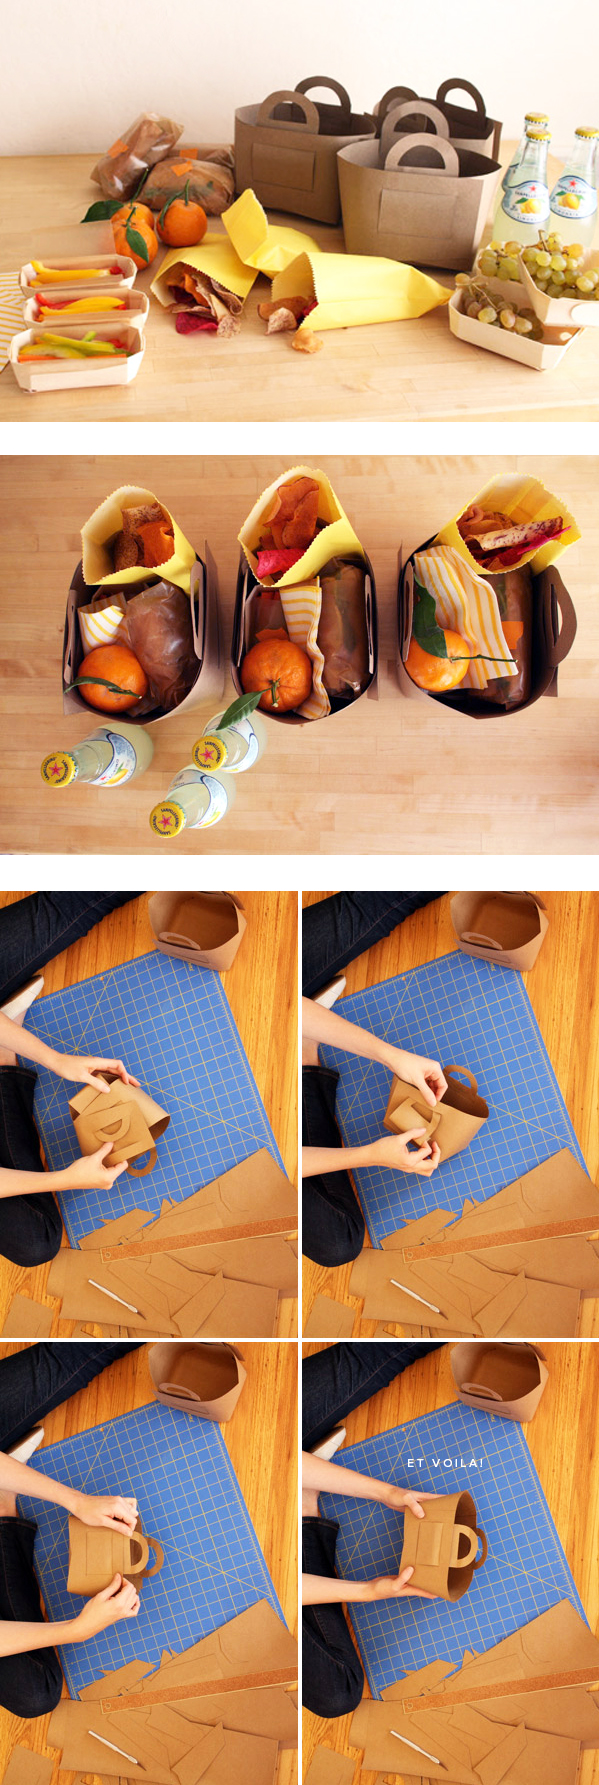 DIY Picnic Baskets - tutorial and free printable template ...